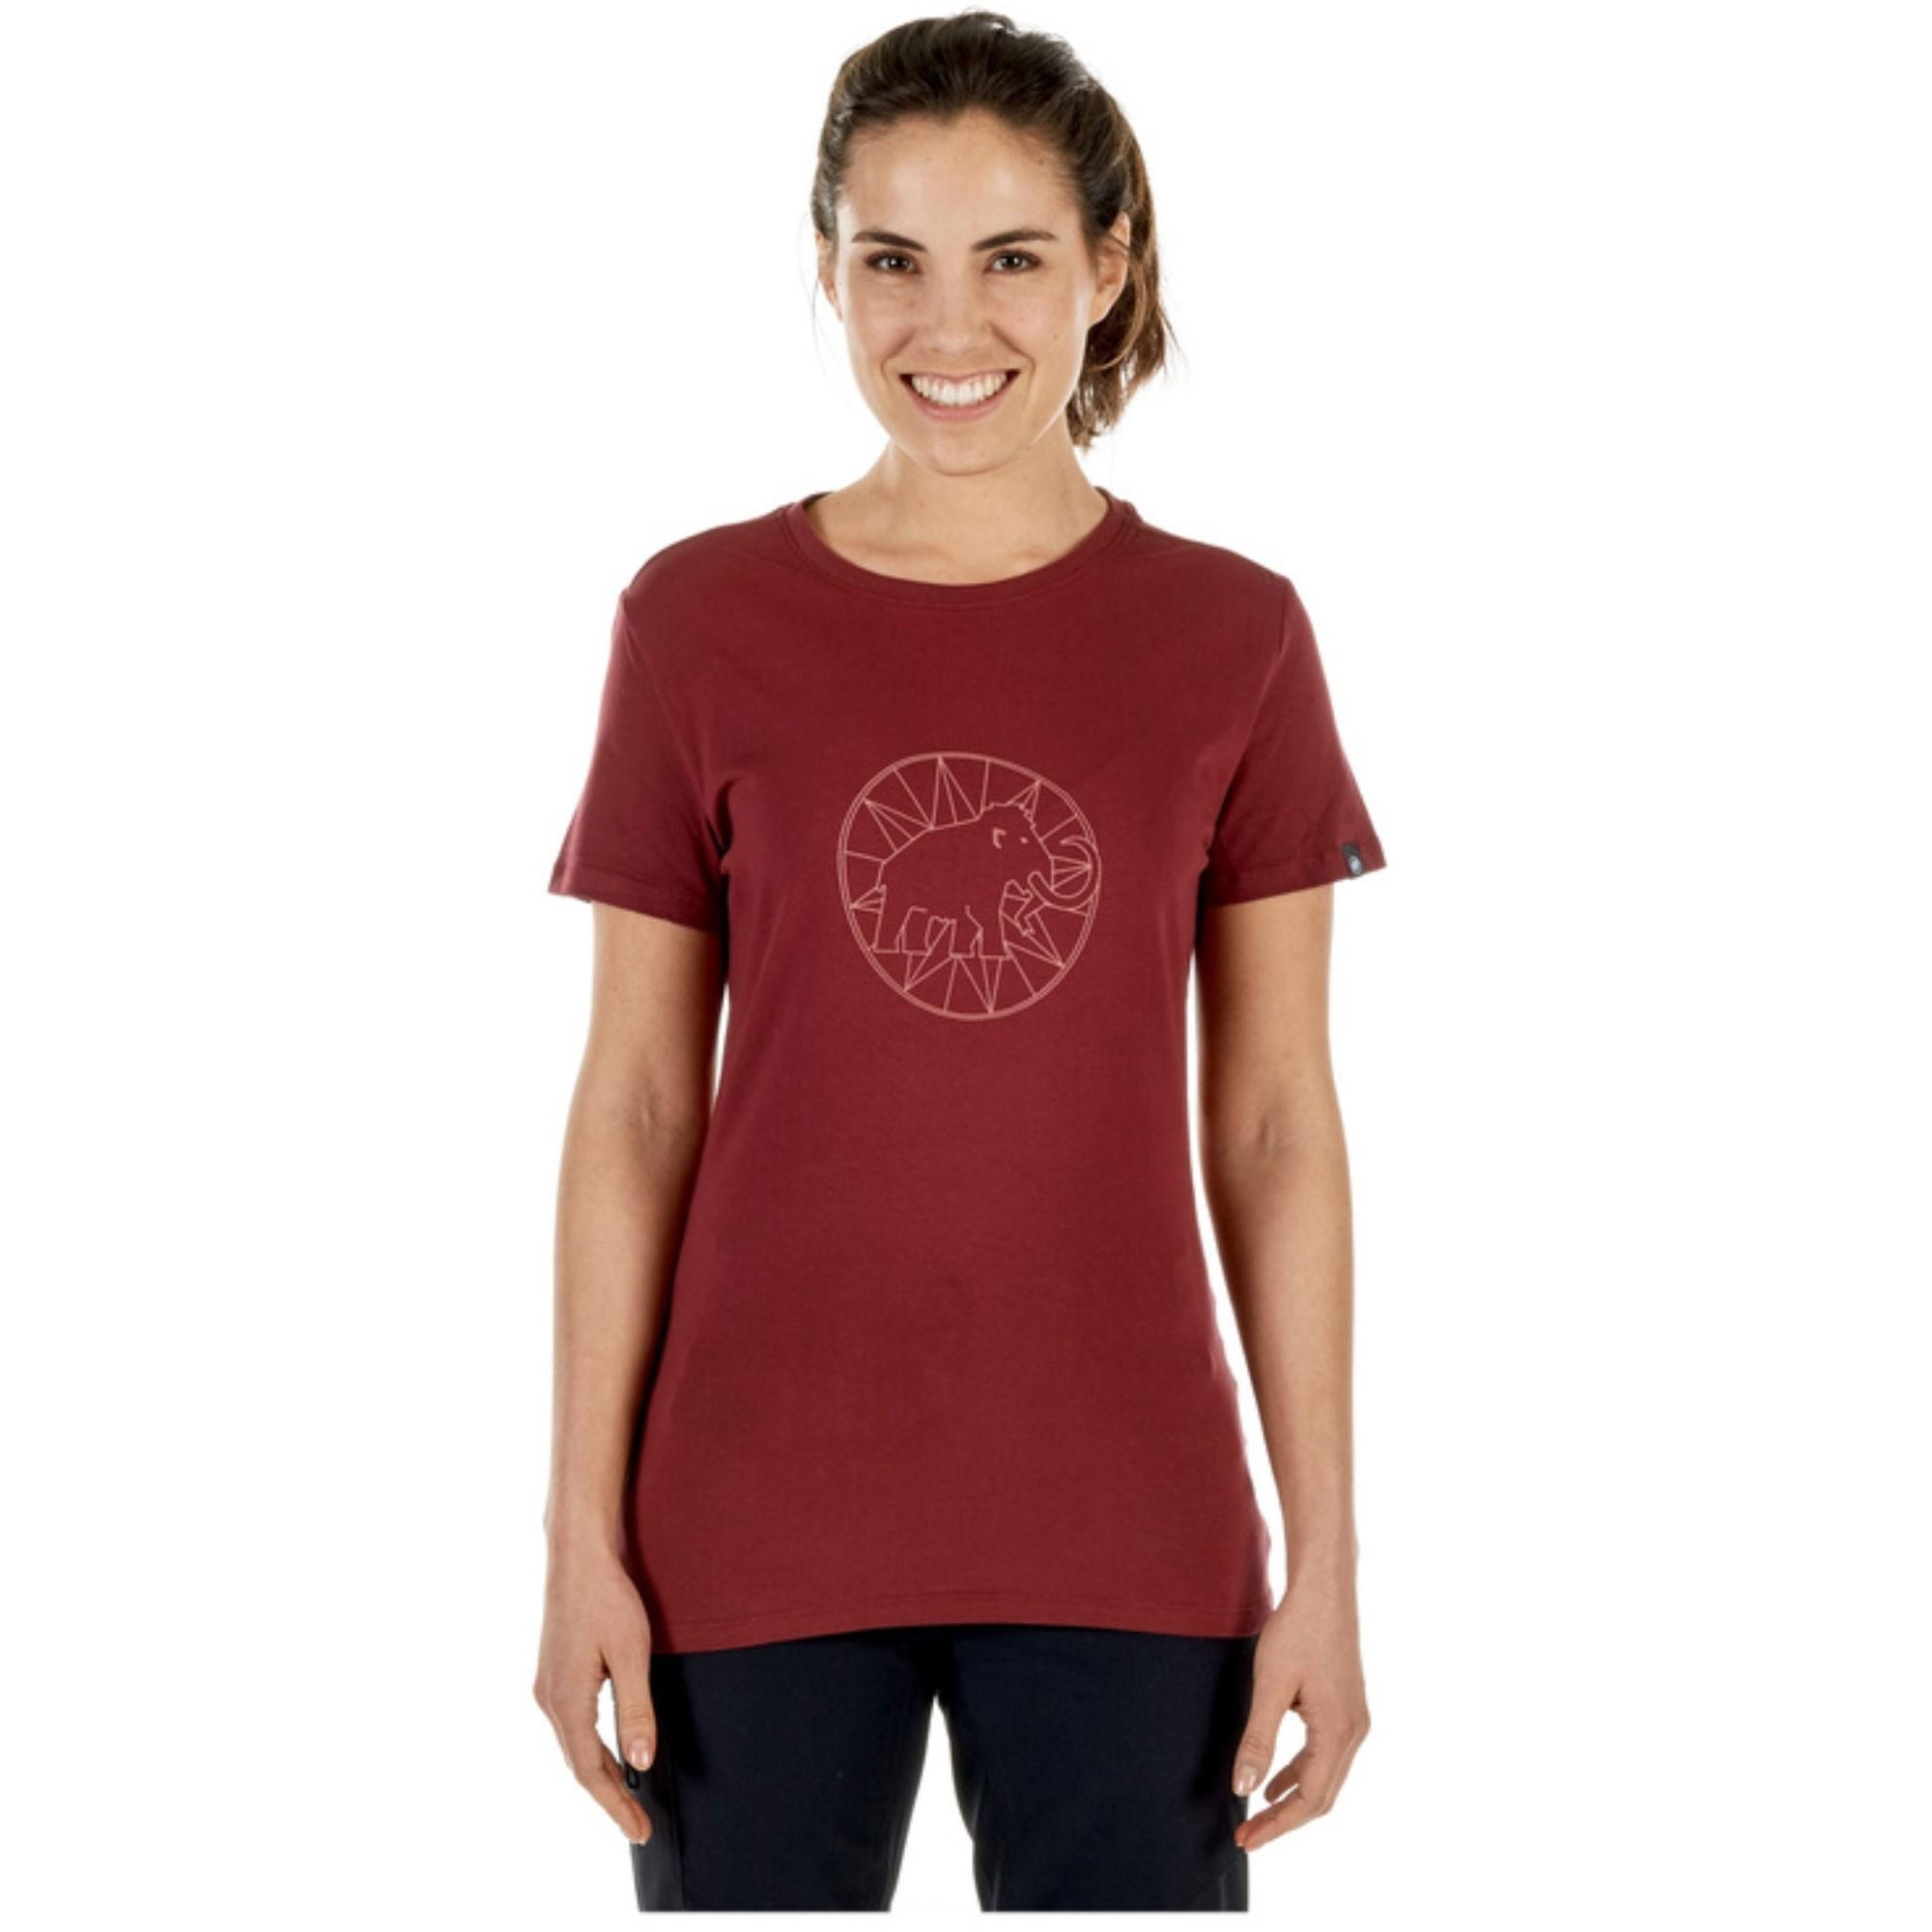 Mammut Women's Logo T-shirt - Merlot/Rose